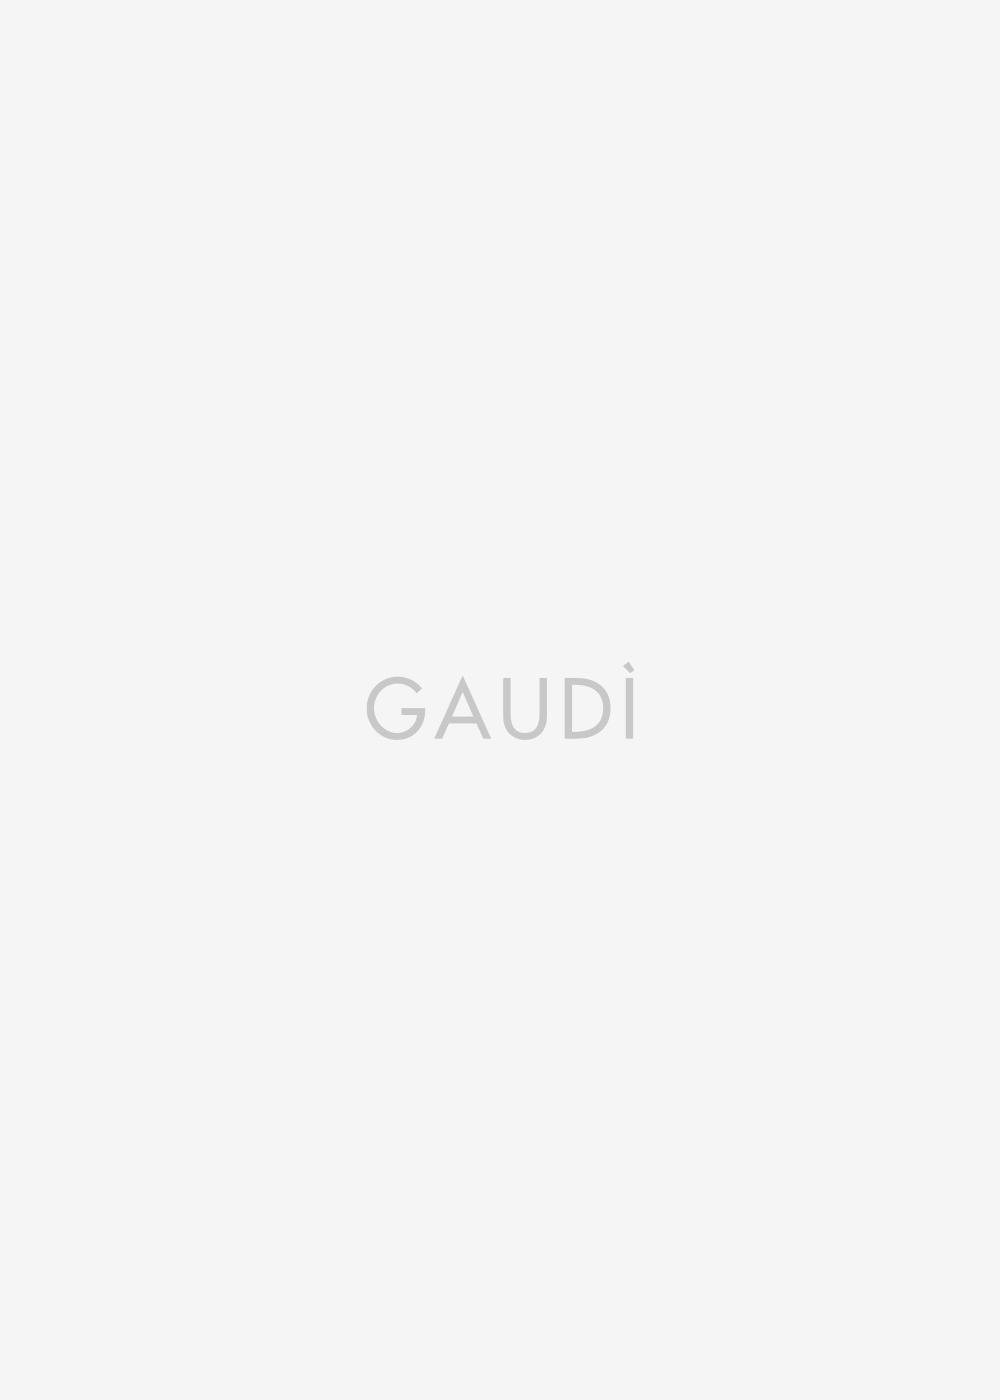 Metallic patent leather bag Gaudì Fashion